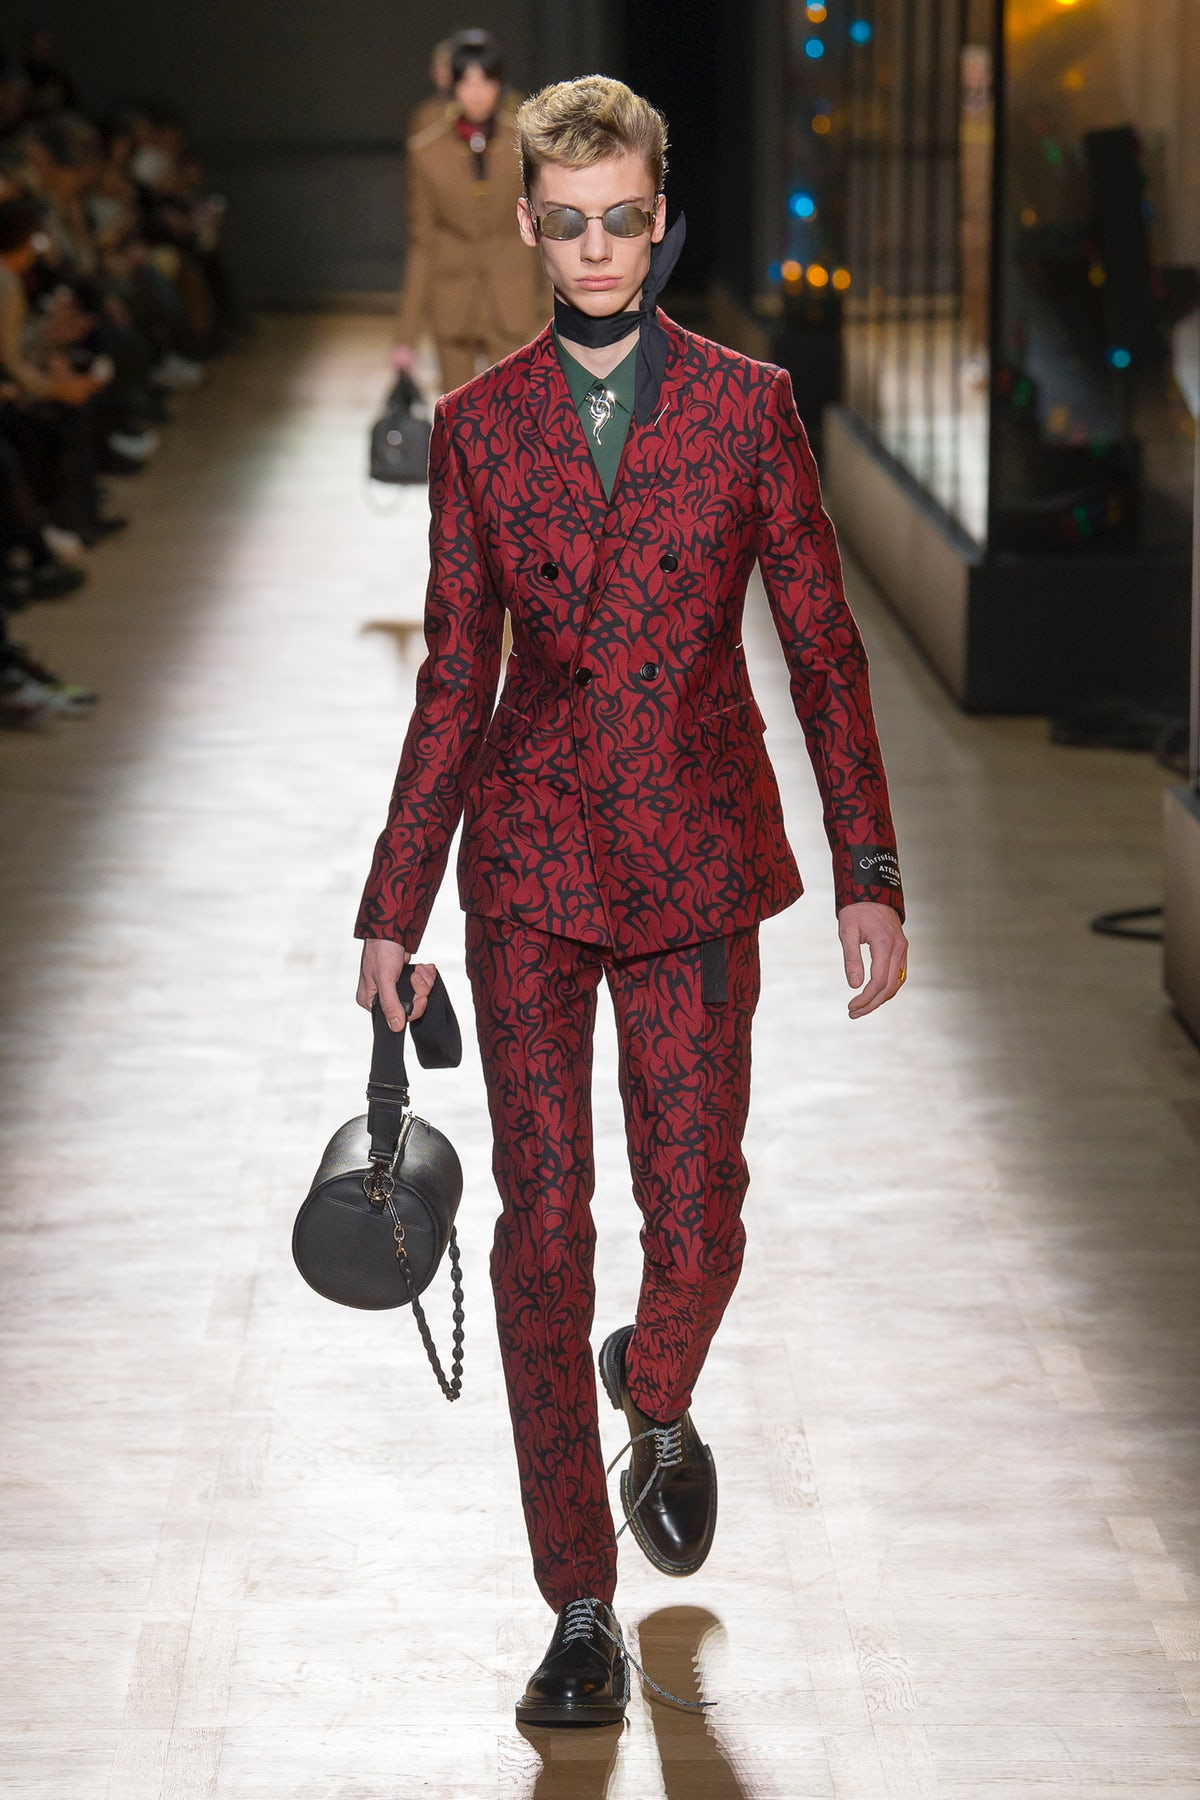 dior_homme_look_28_menswear_autumn_2018.jpeg